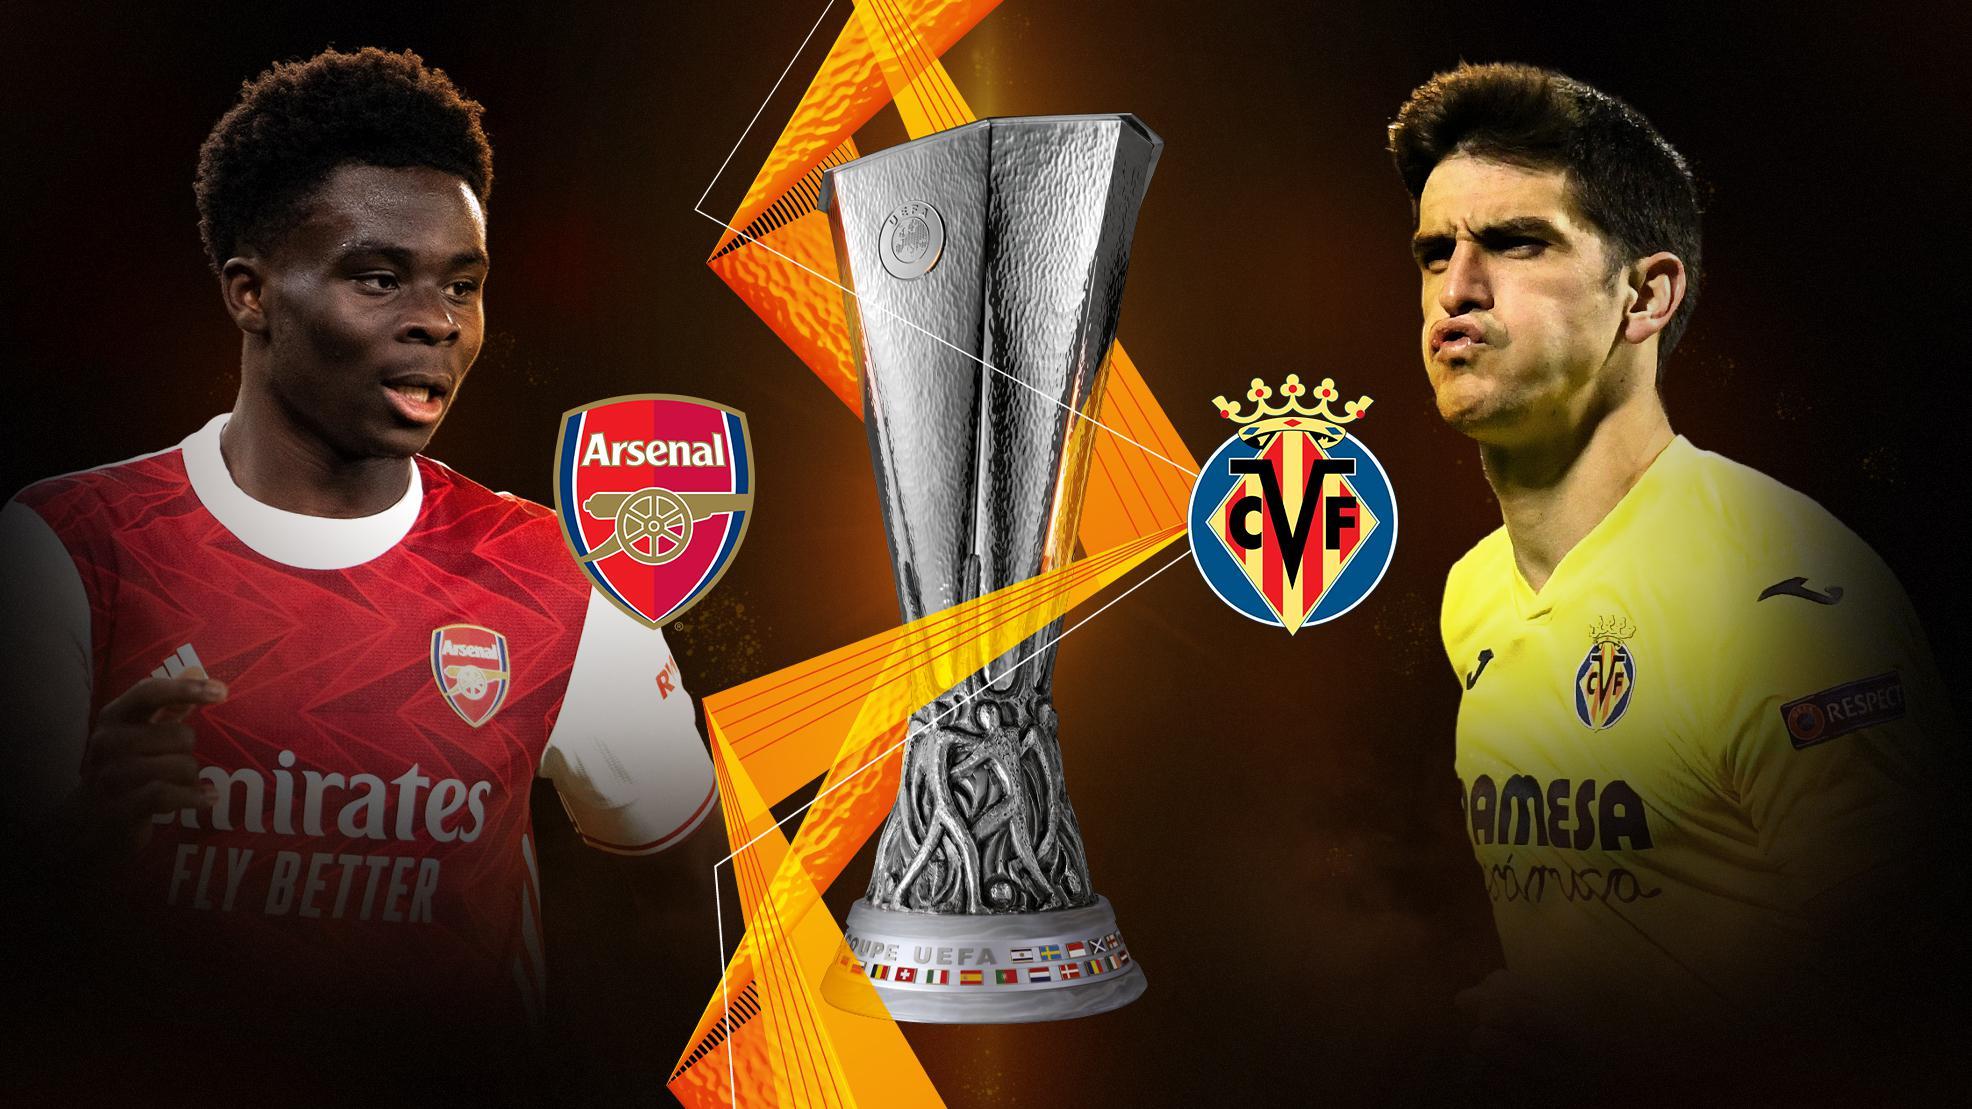 Arsenal-Villarreal | Arsenal vs Villarreal Europa League preview: where to  watch, team news, predictions | UEFA Europa League | UEFA.com